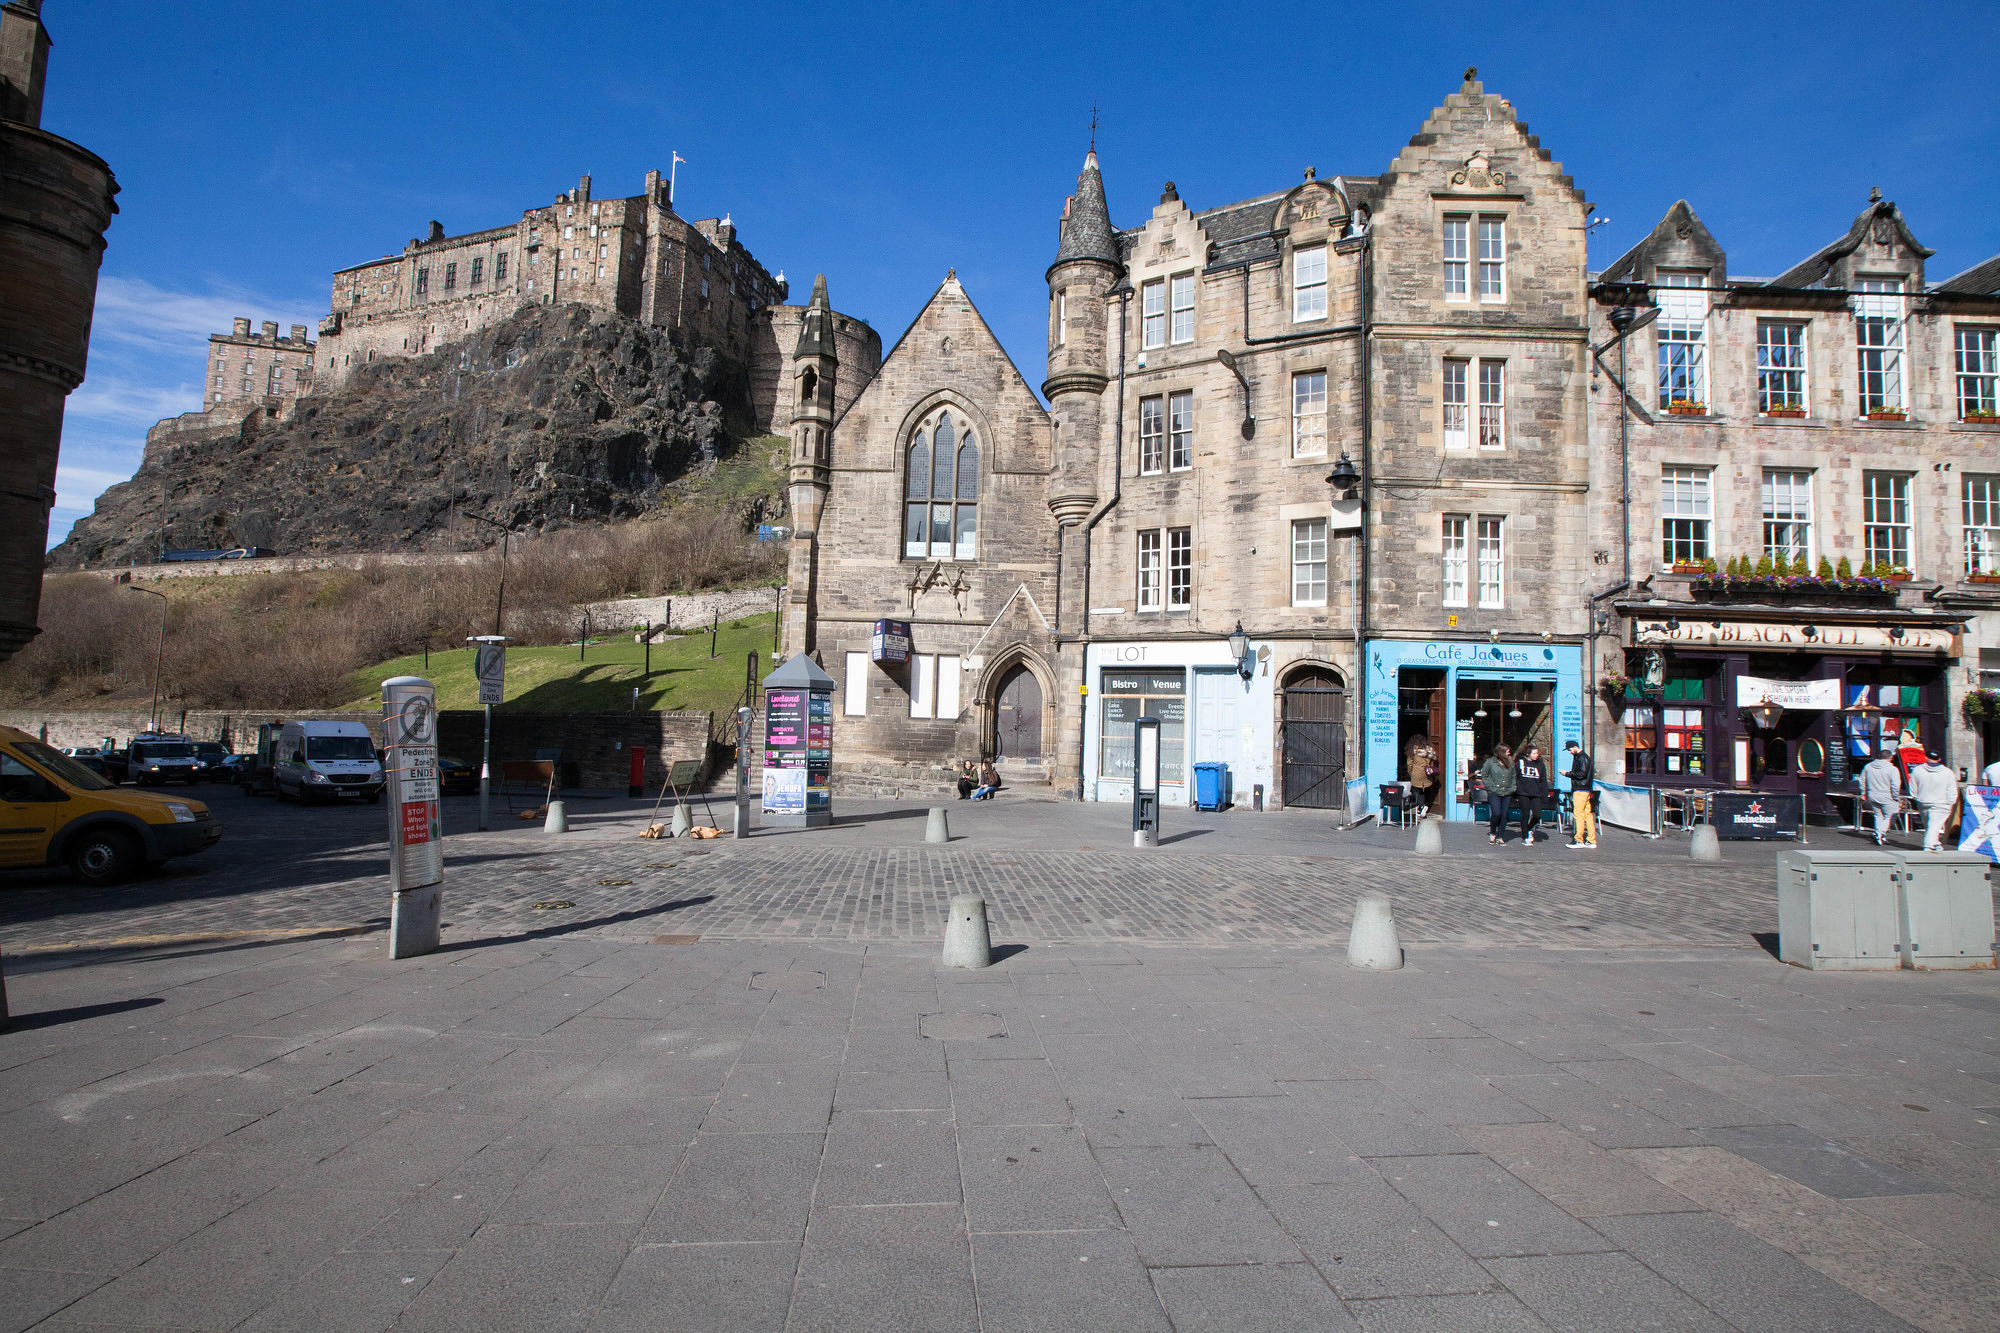 Street at the Apex Grassmarket Hotel, Edinburgh